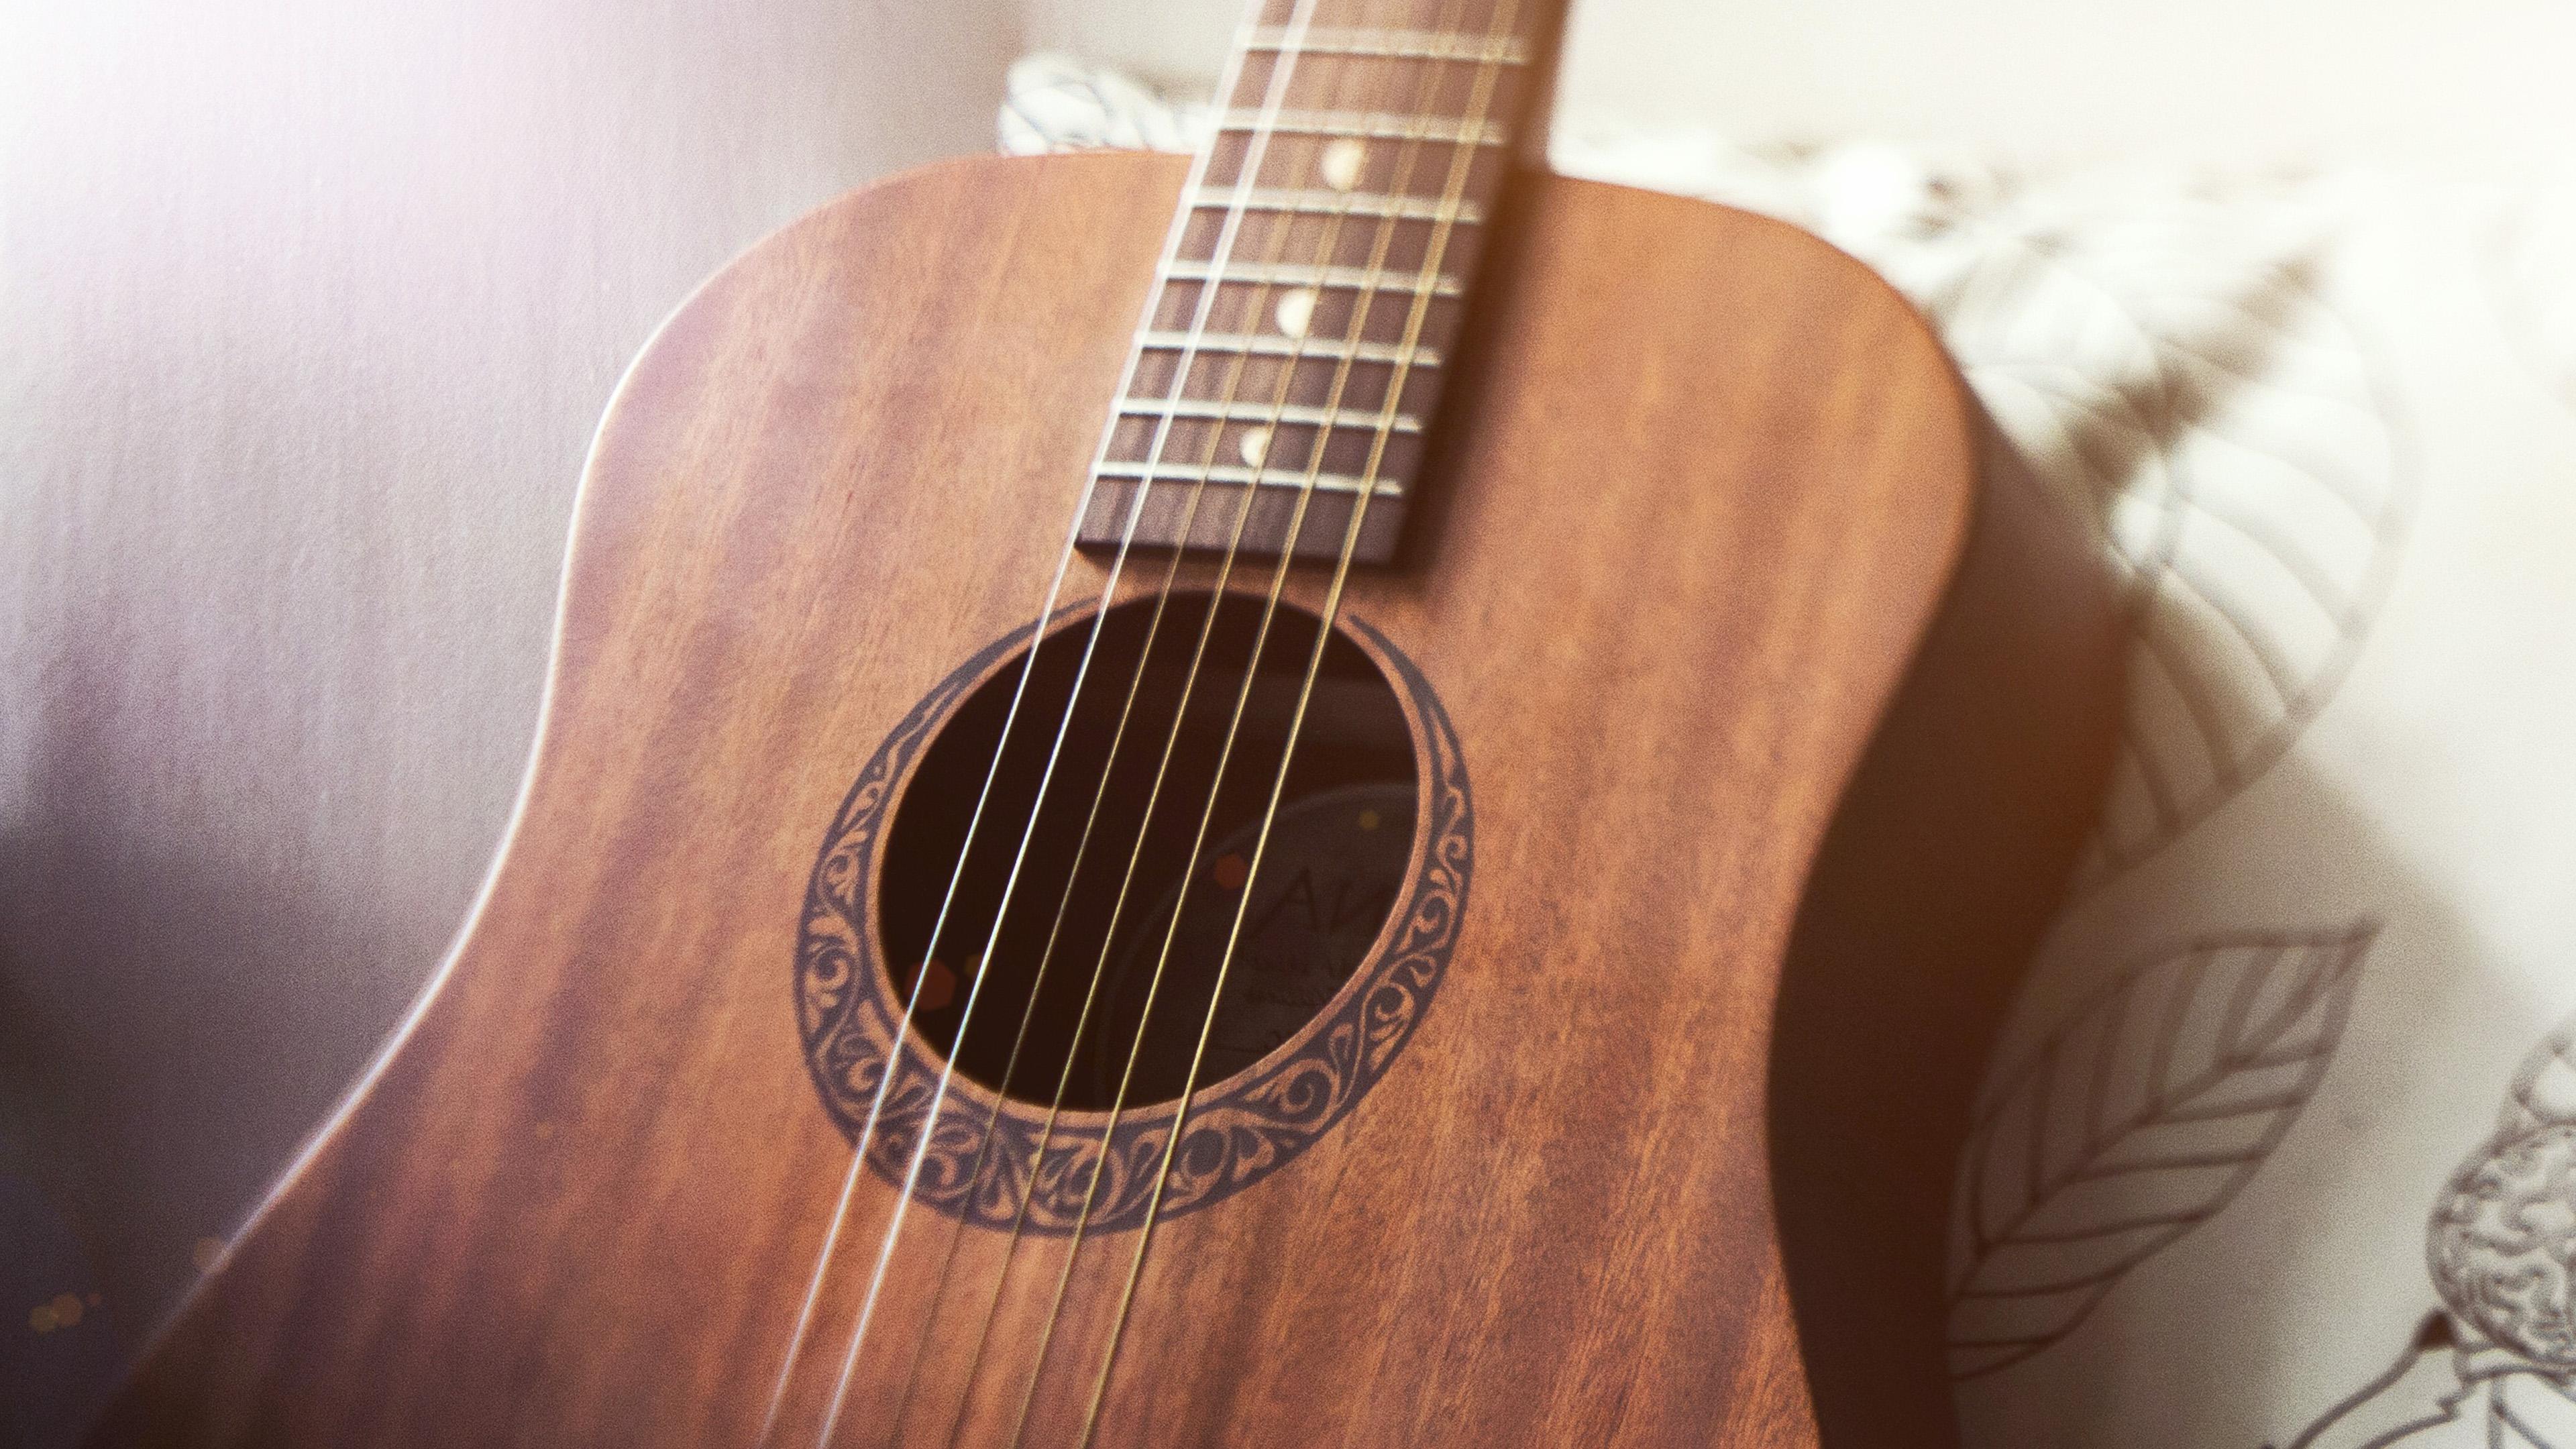 wallpaper for desktop, laptop | nf89-classic-guitar ...